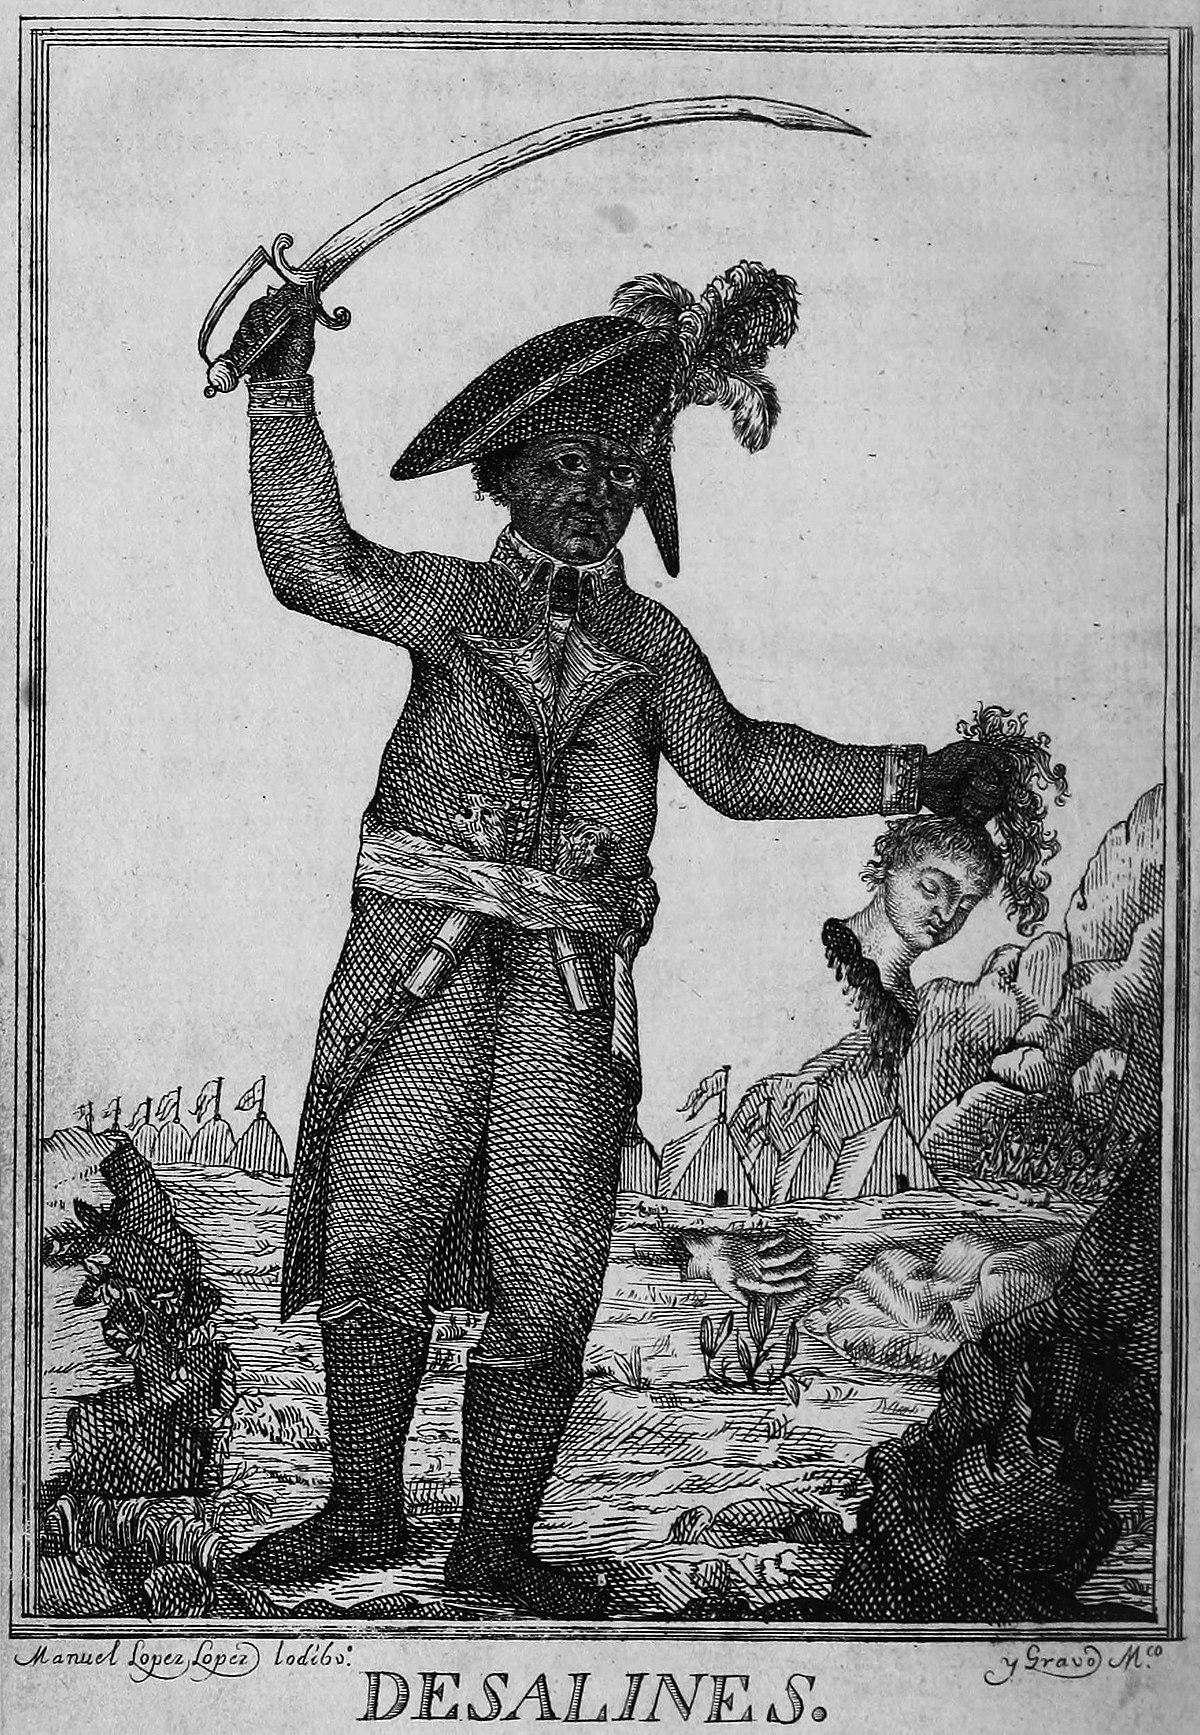 1804 massacre